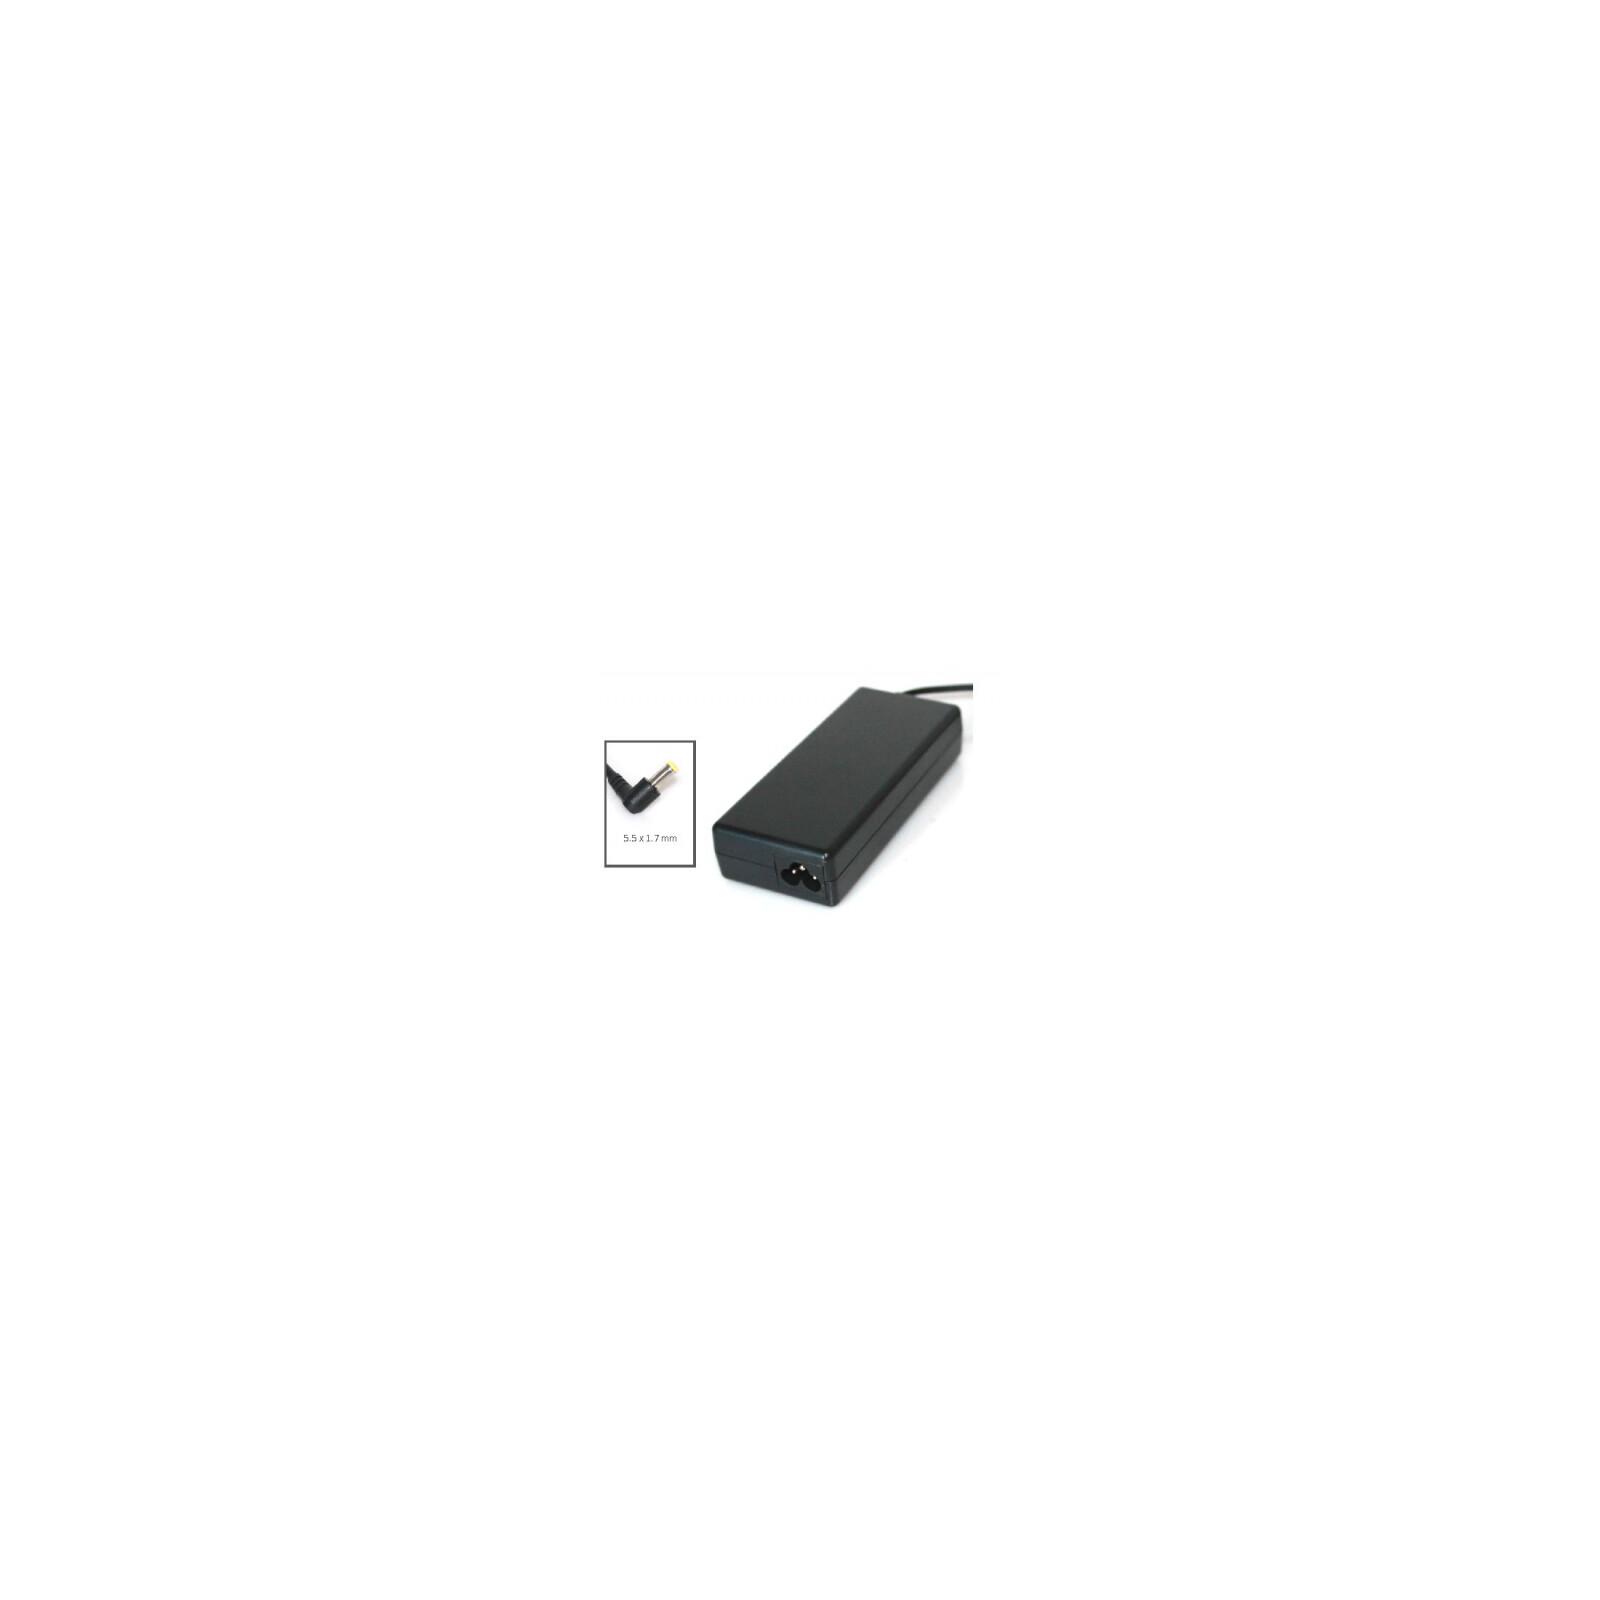 AGI Netzteil Acer Aspire 1640 90W